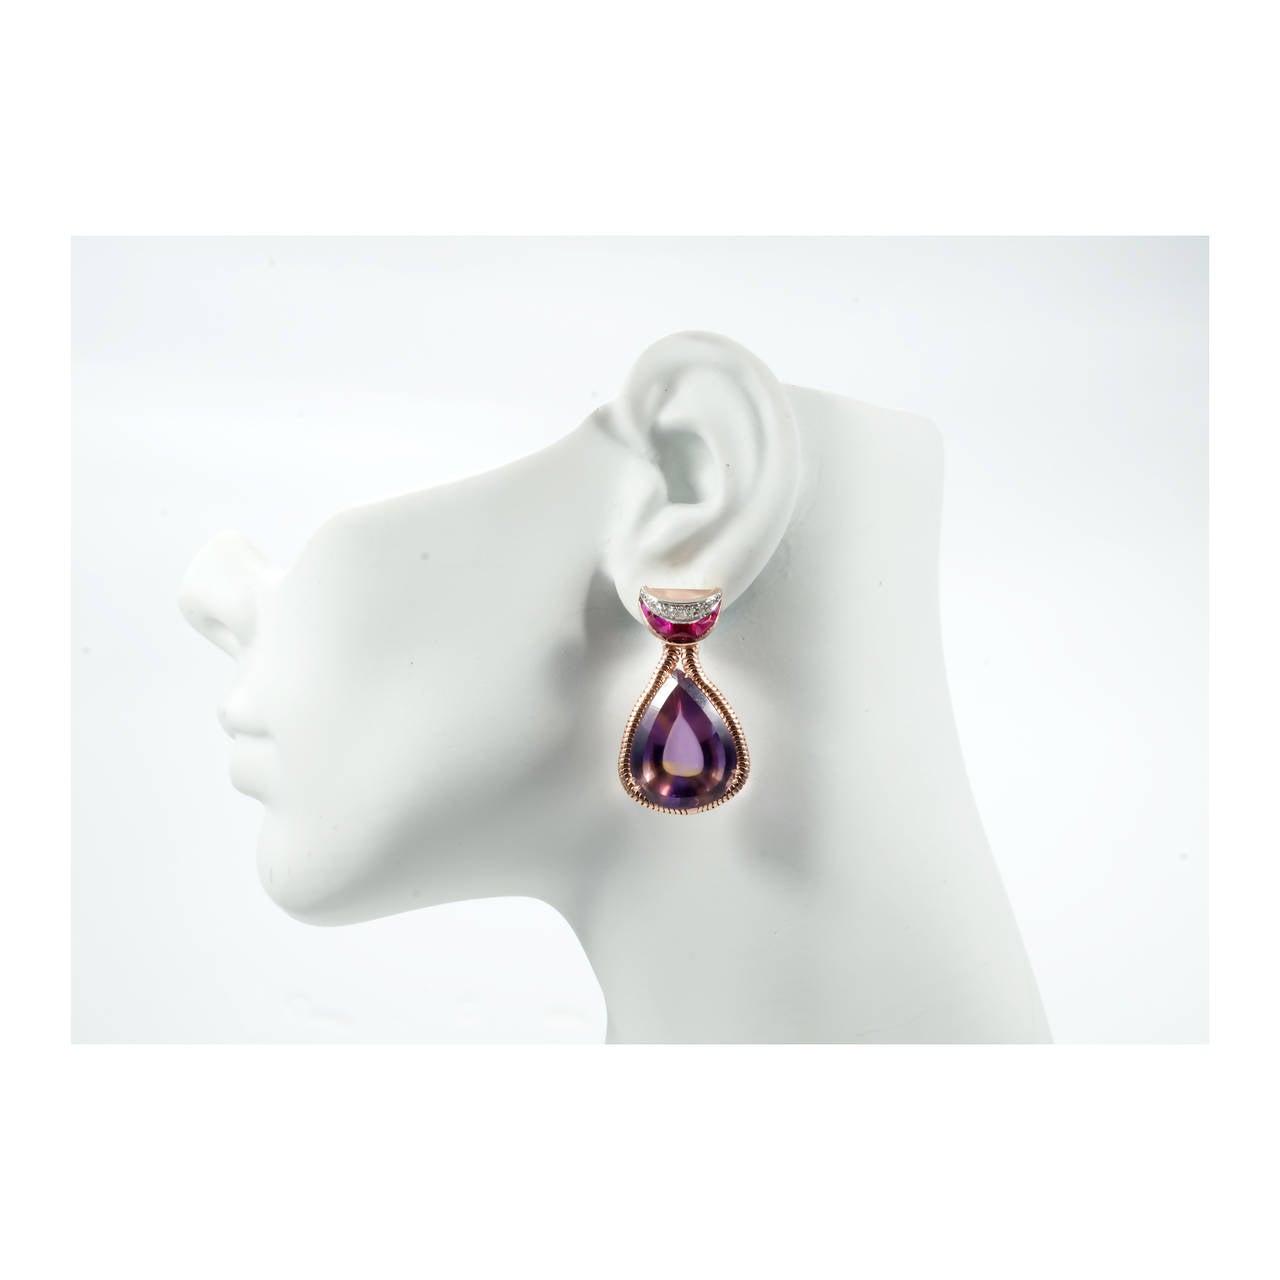 Unique Pear Shaped Amethyst Citrine Gold Dangle Earrings 7